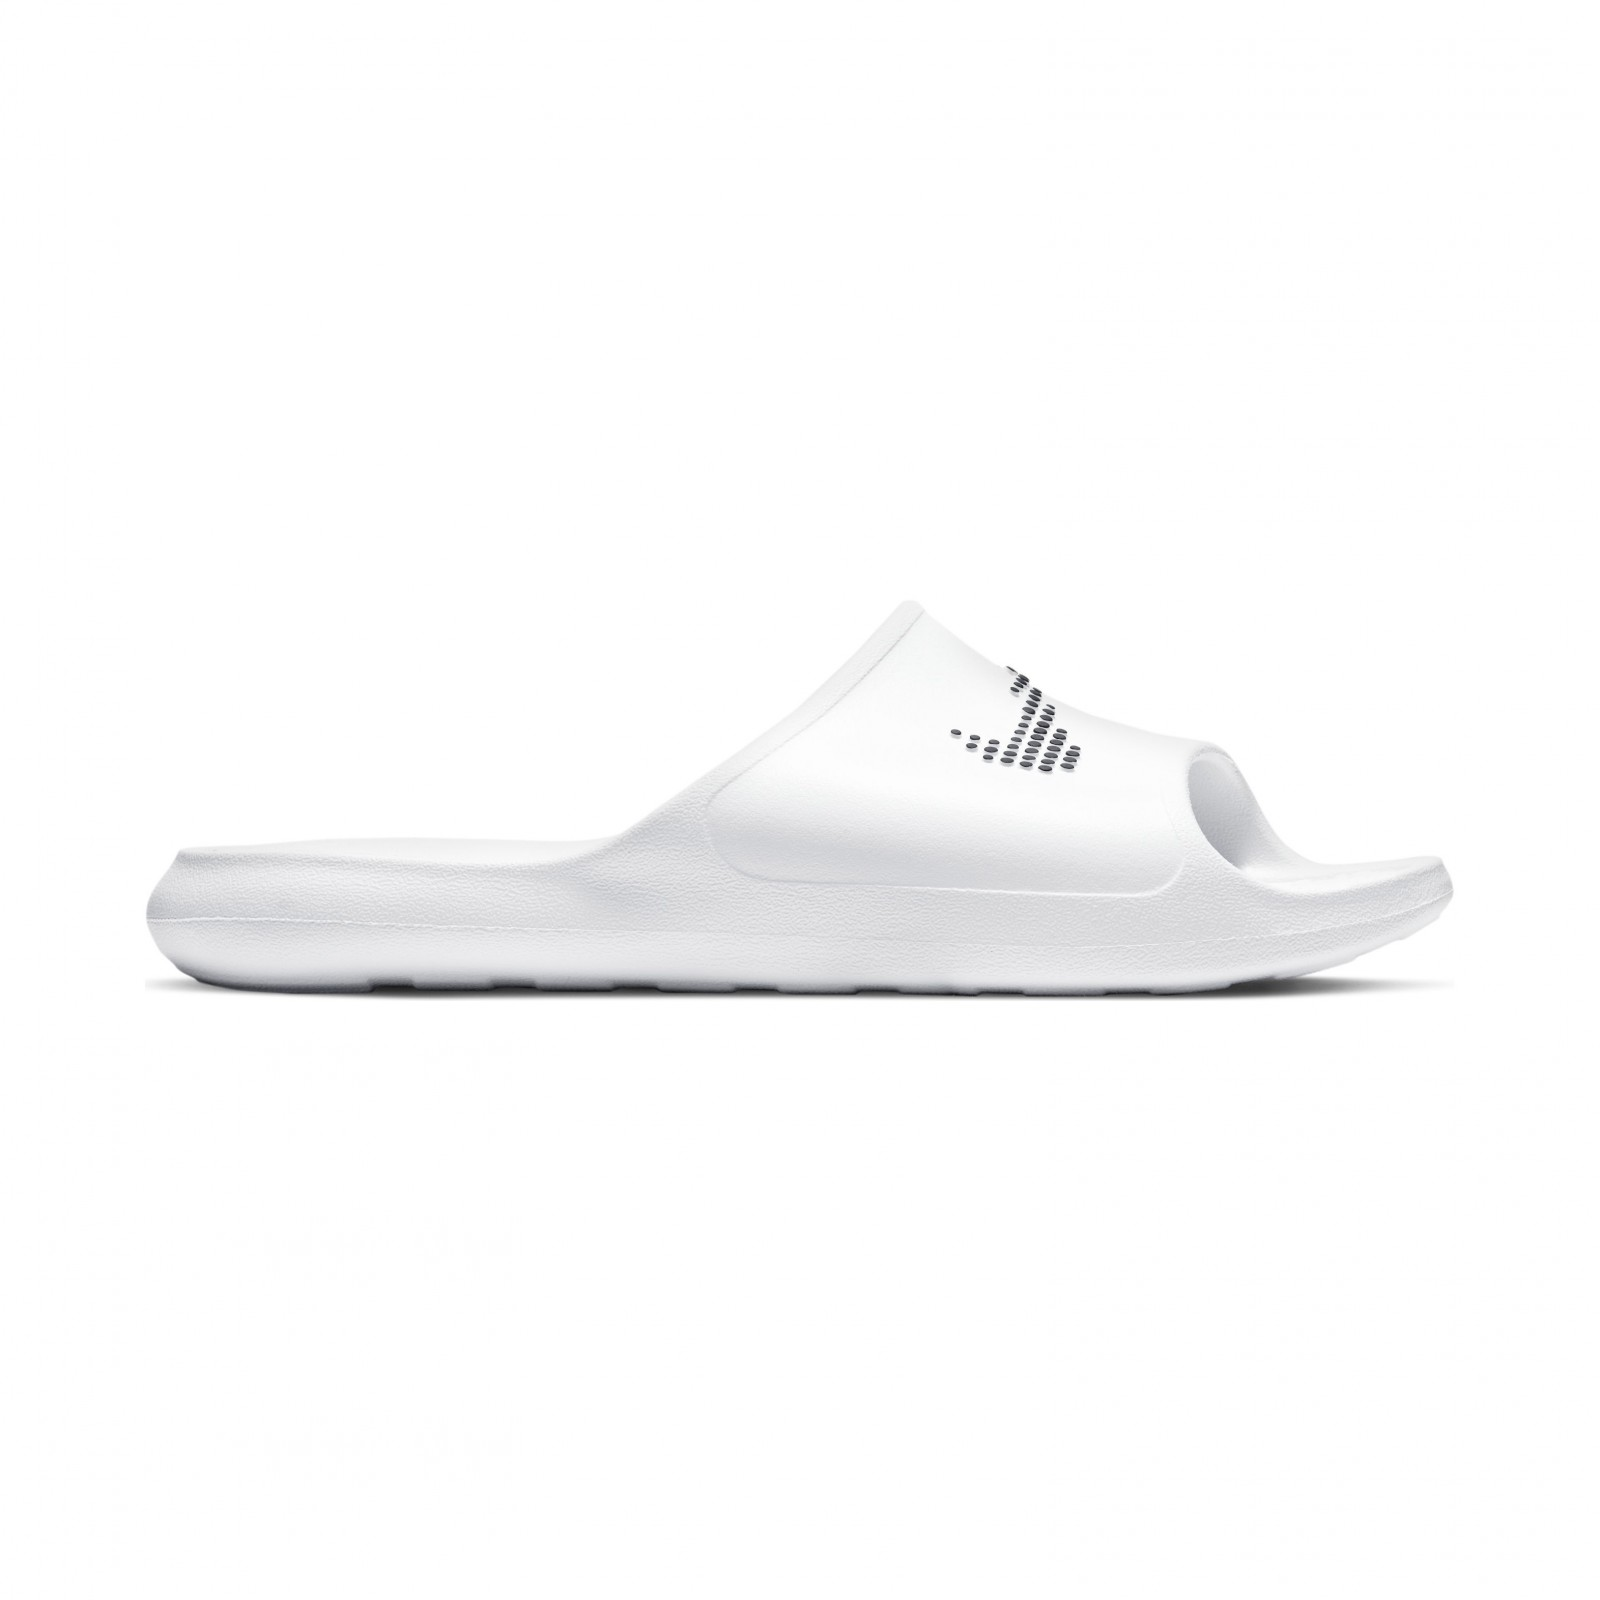 Nike Victori One WHITE/BLACK-WHITE